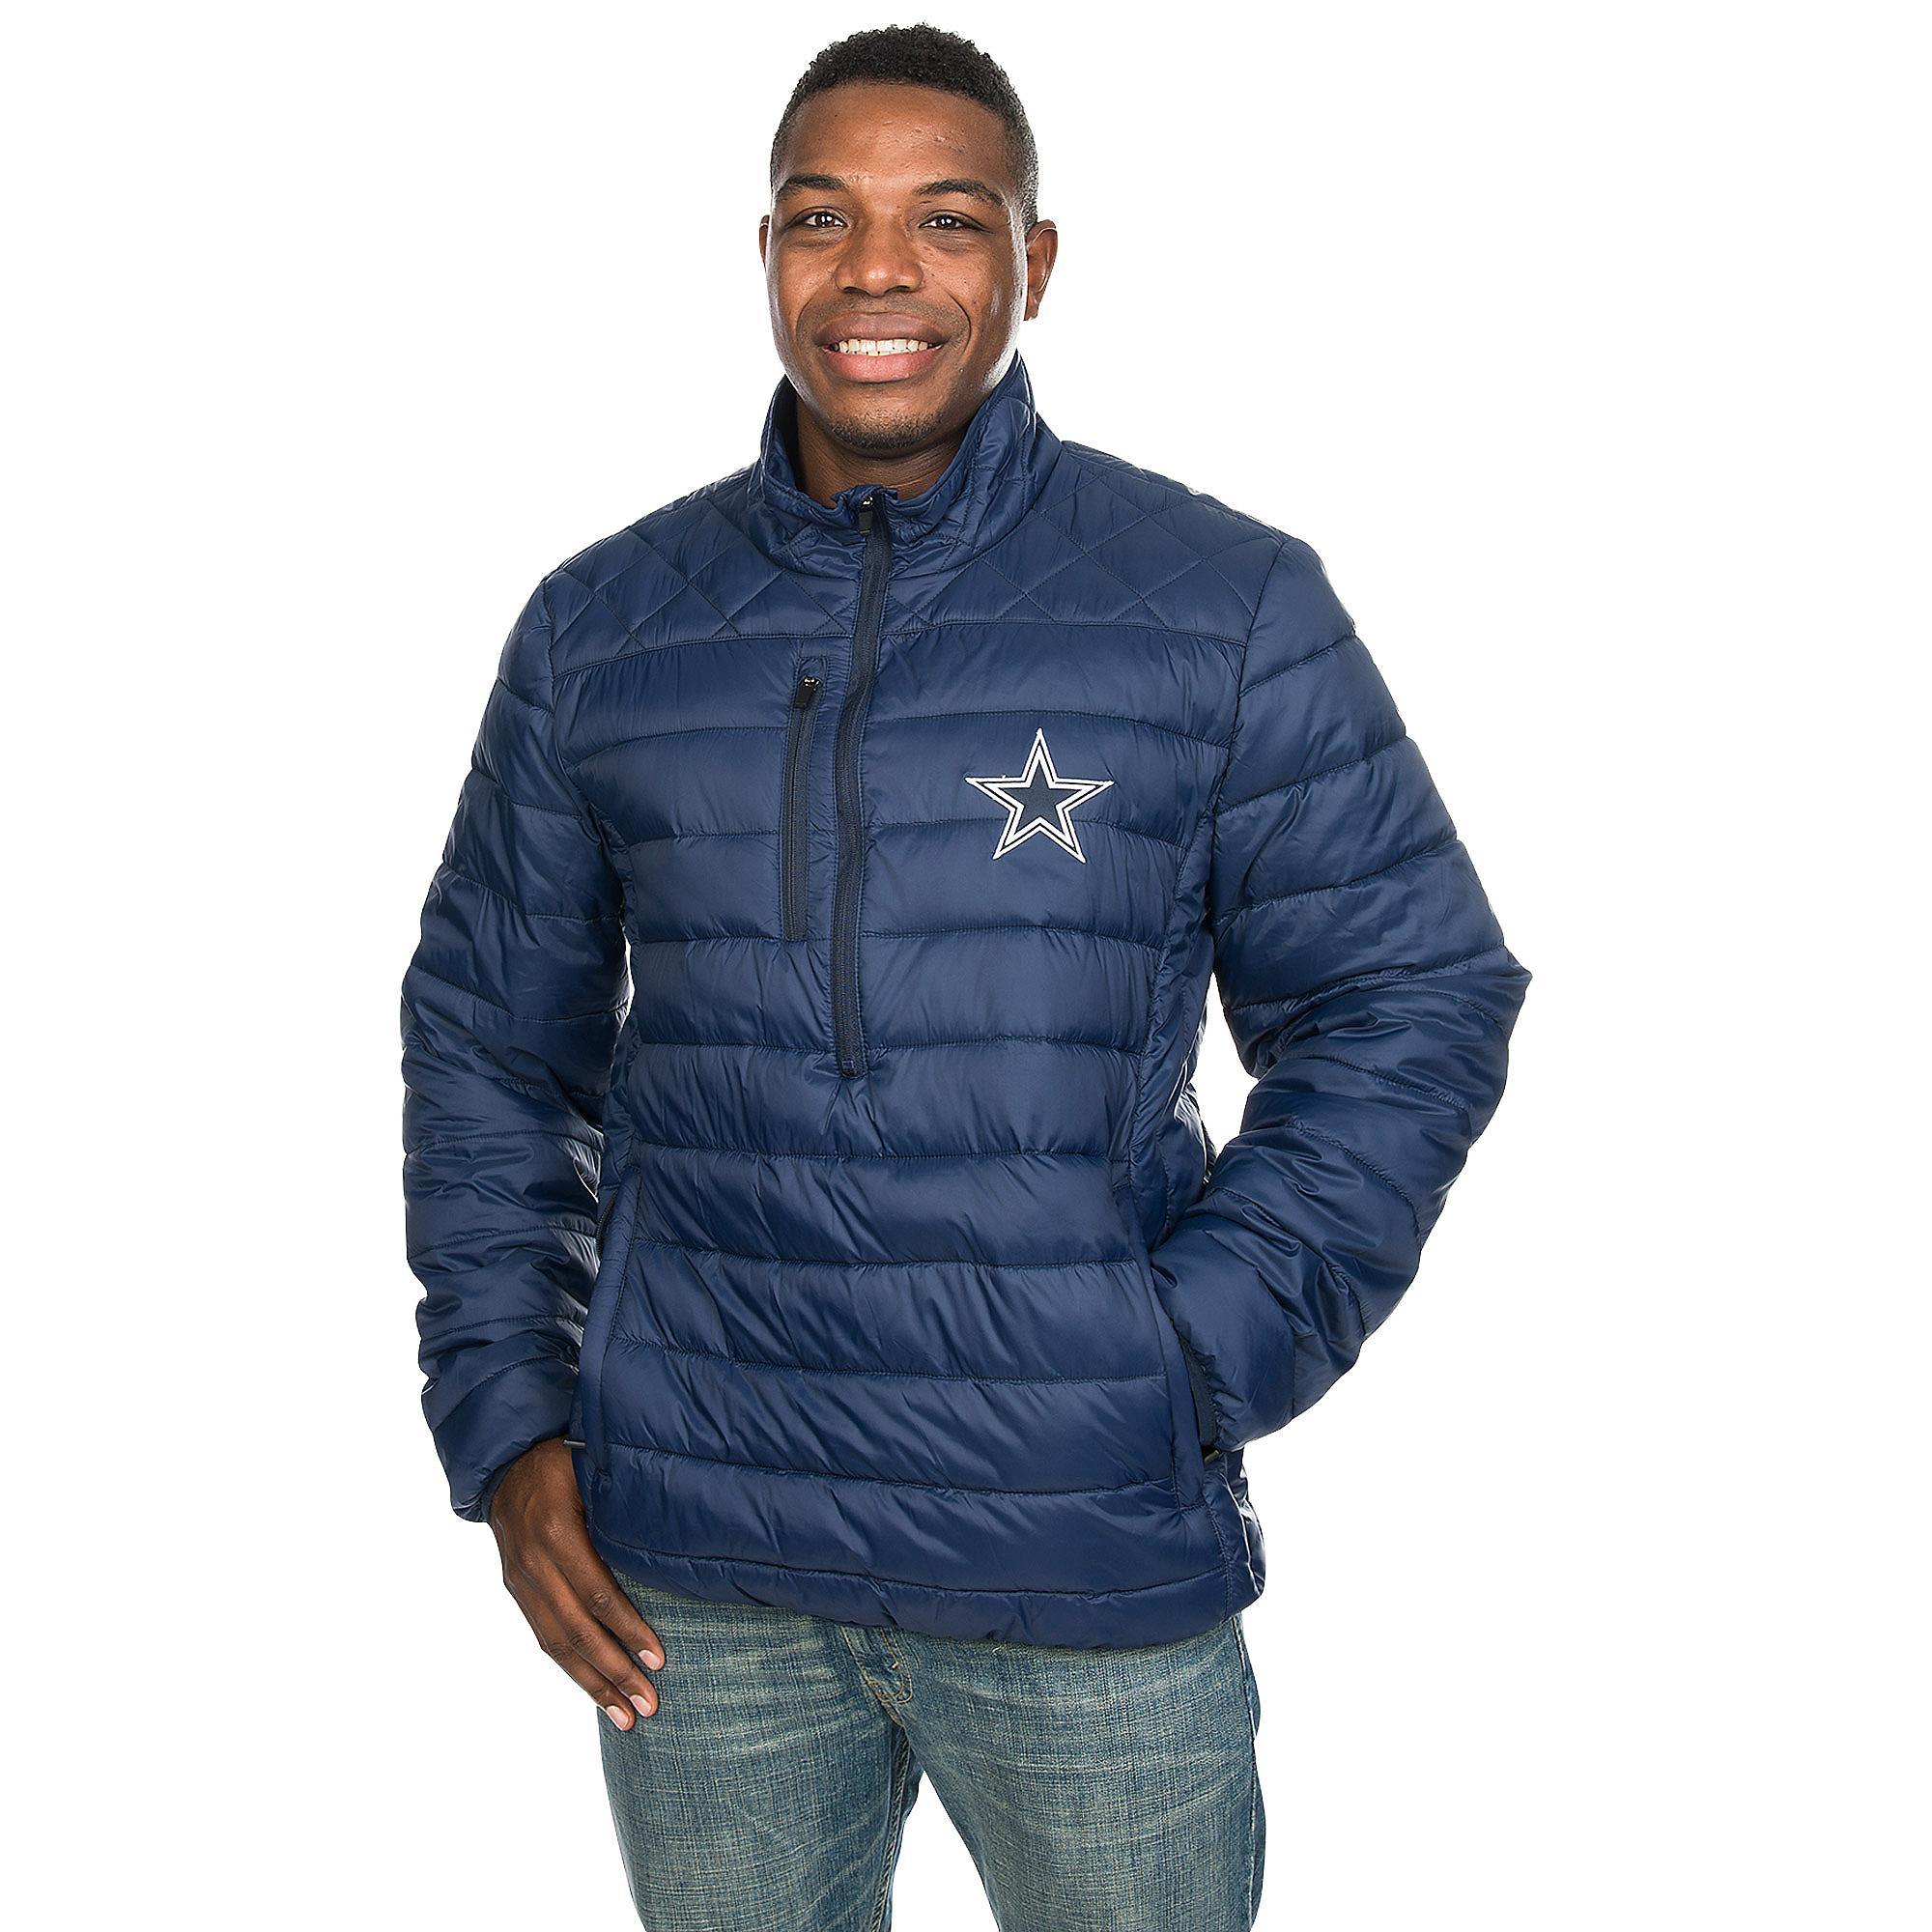 Dallas Cowboys Triangle Offense Jacket